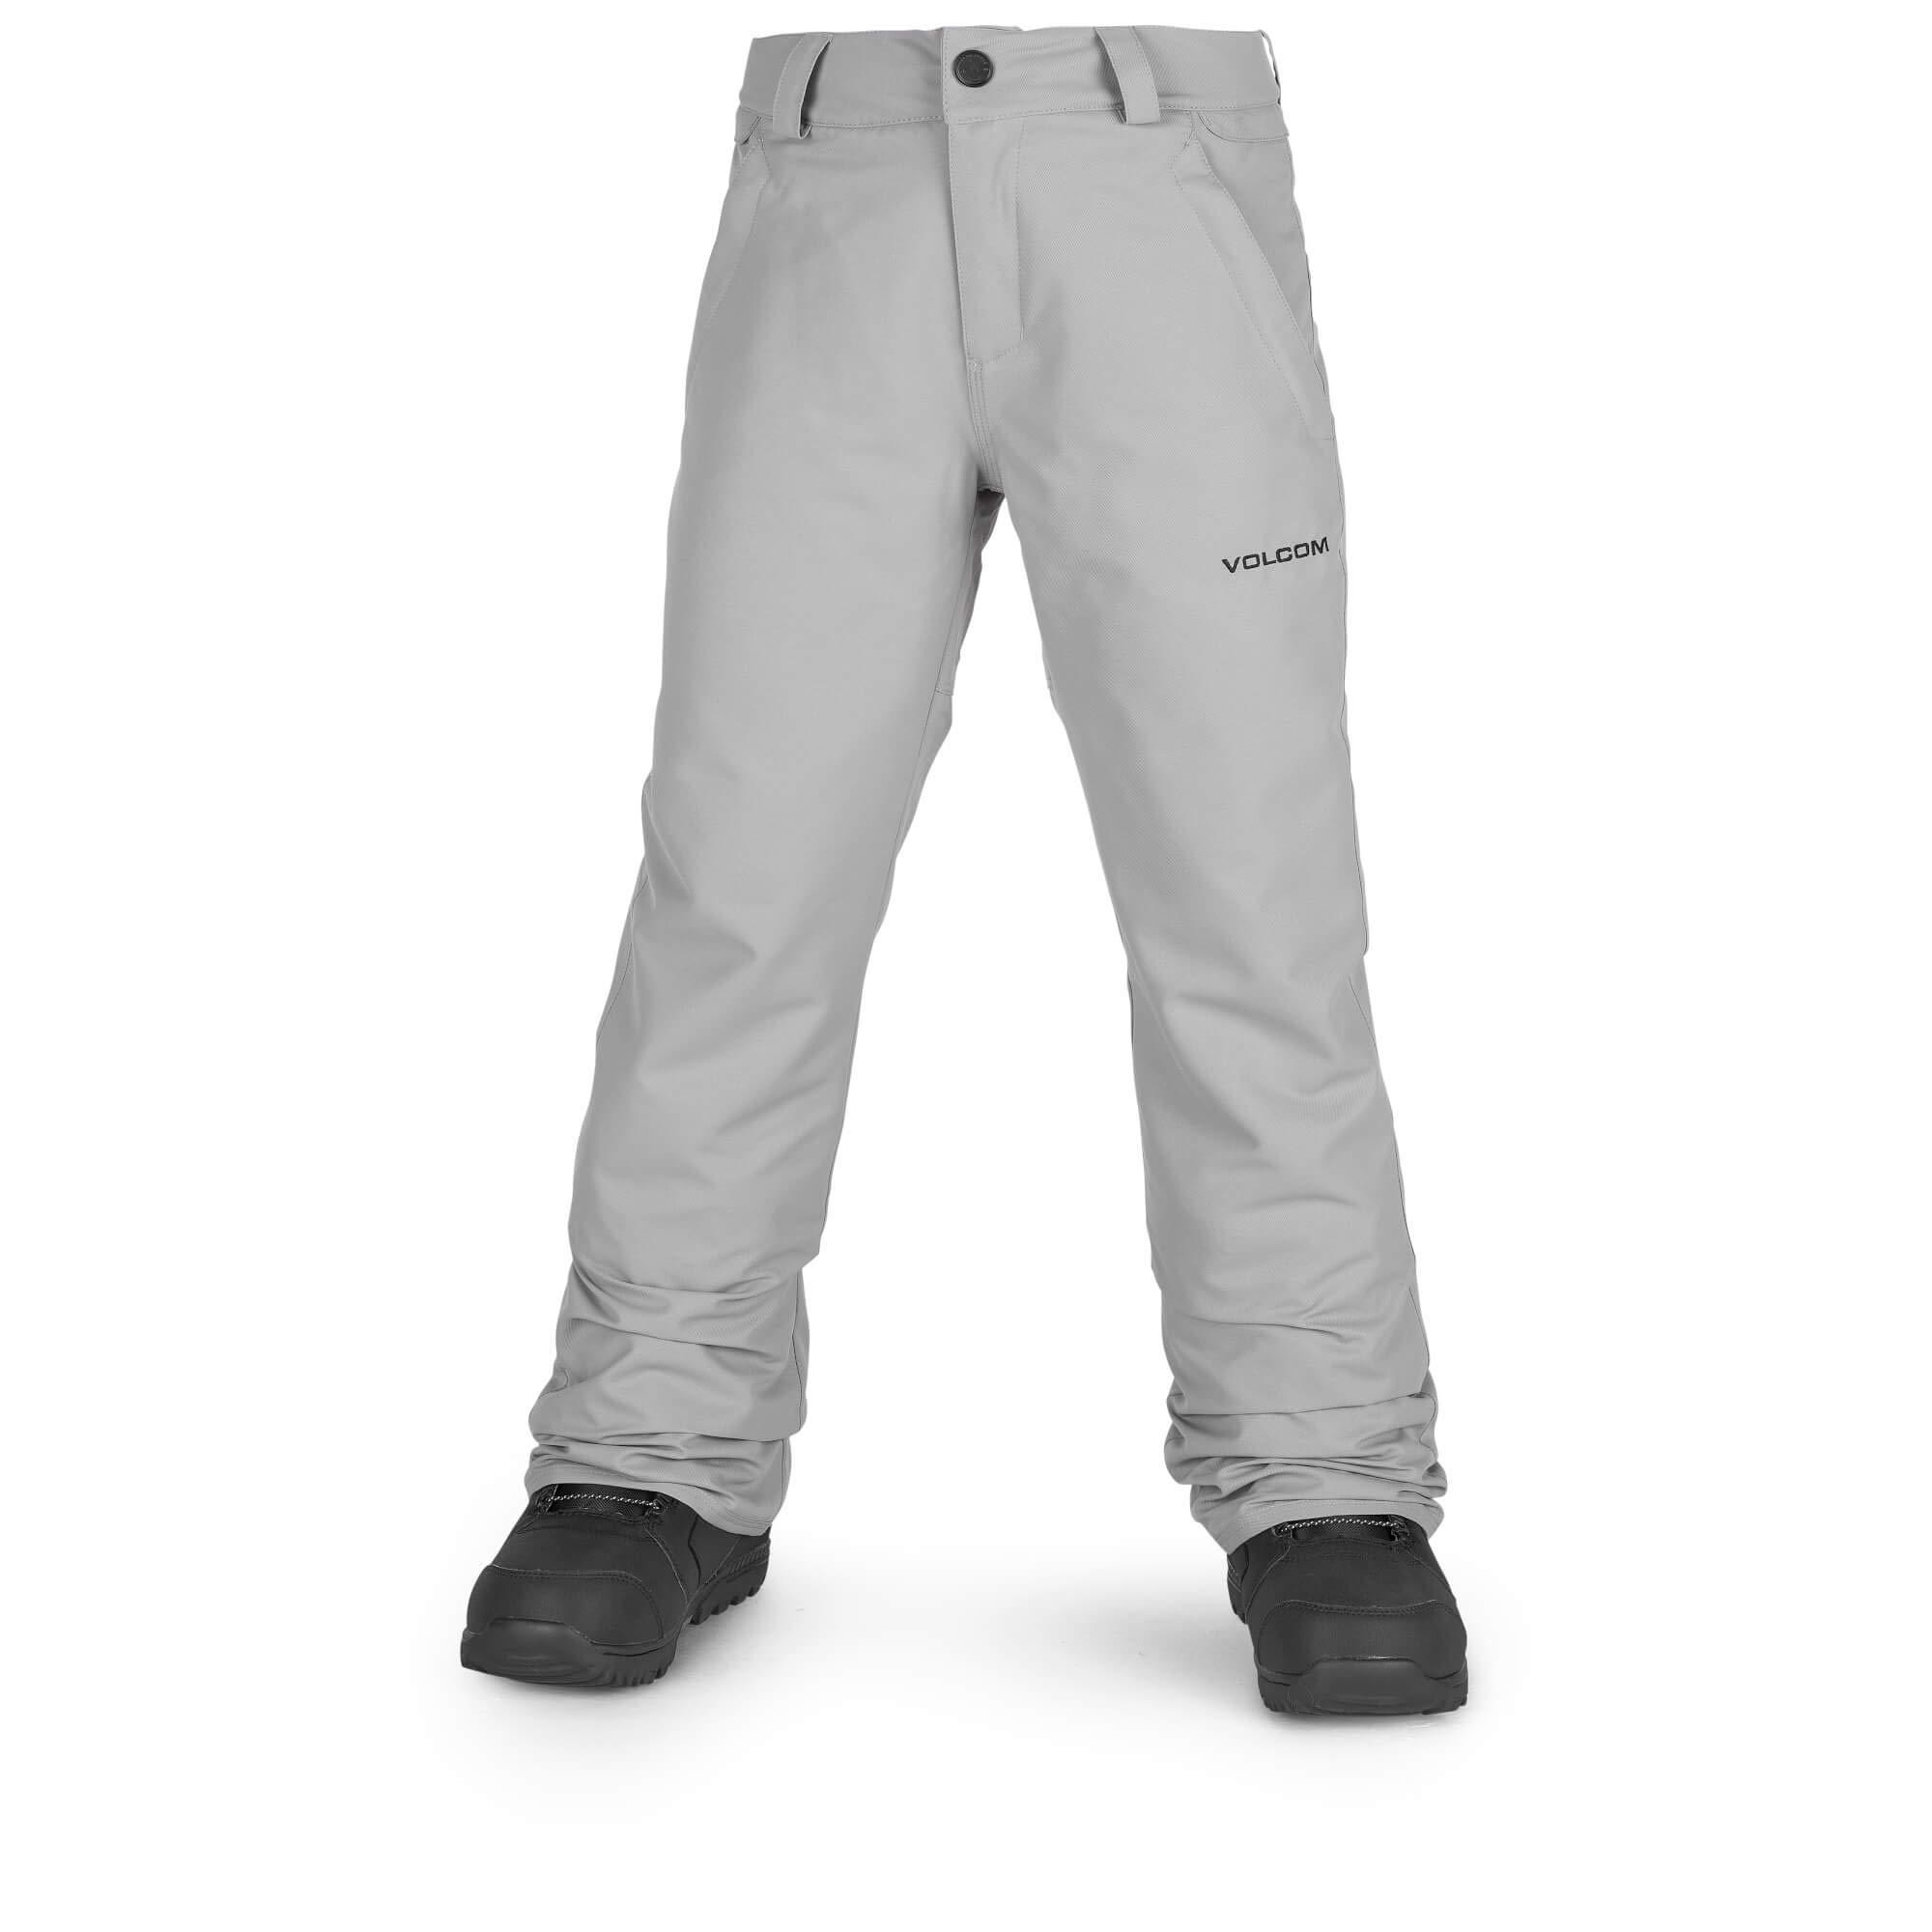 Volcom Boys' Big Freakin 2 Layer Shell Chino Snow Pant, Charcoal, Medium